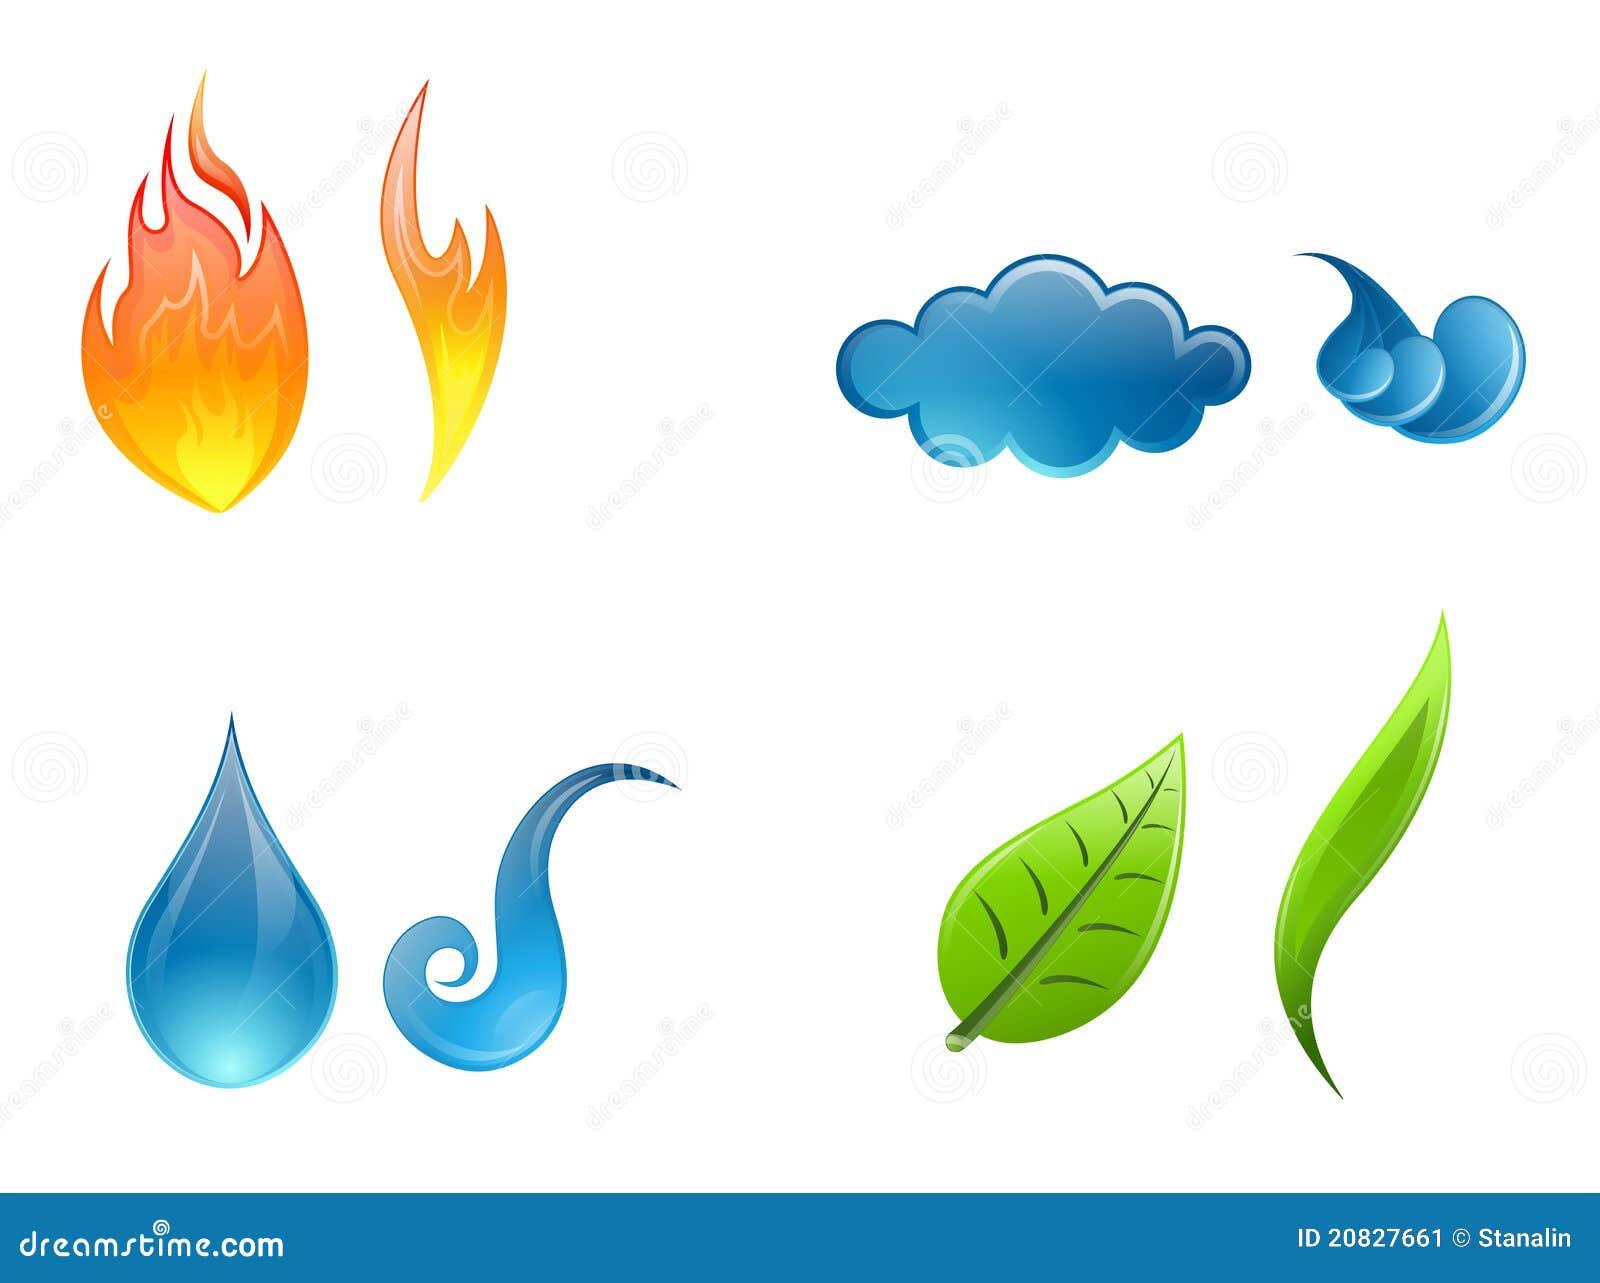 Quatro elementos da natureza